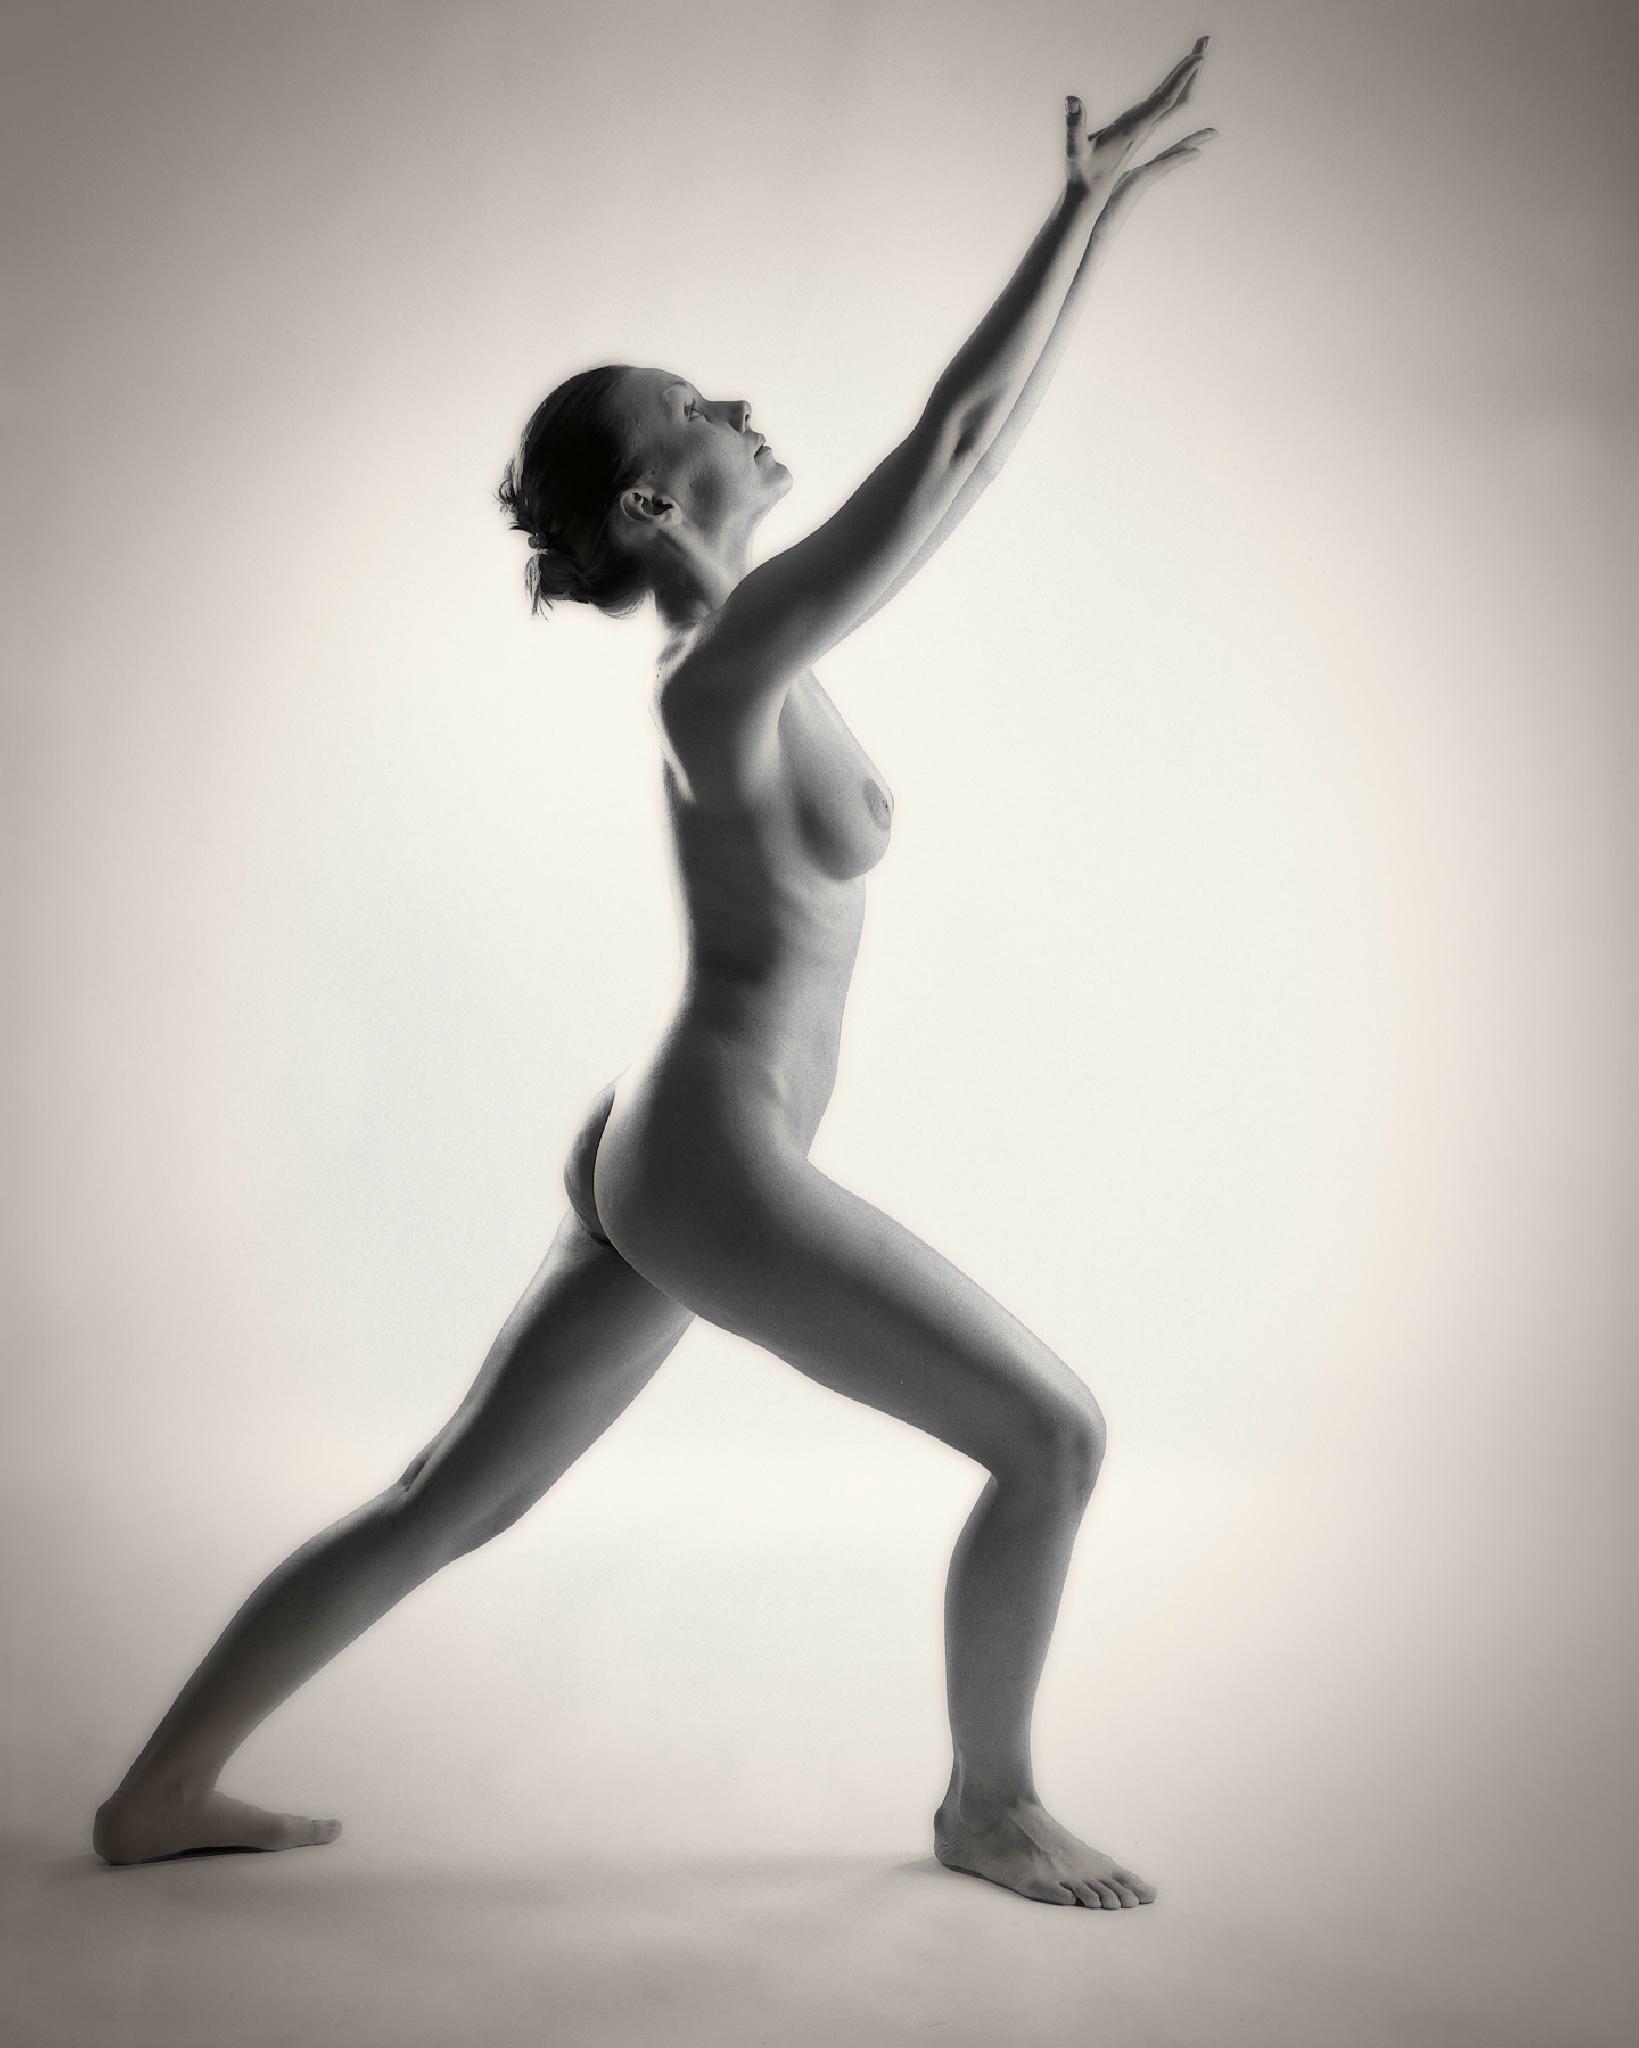 The dancer by Pixforce